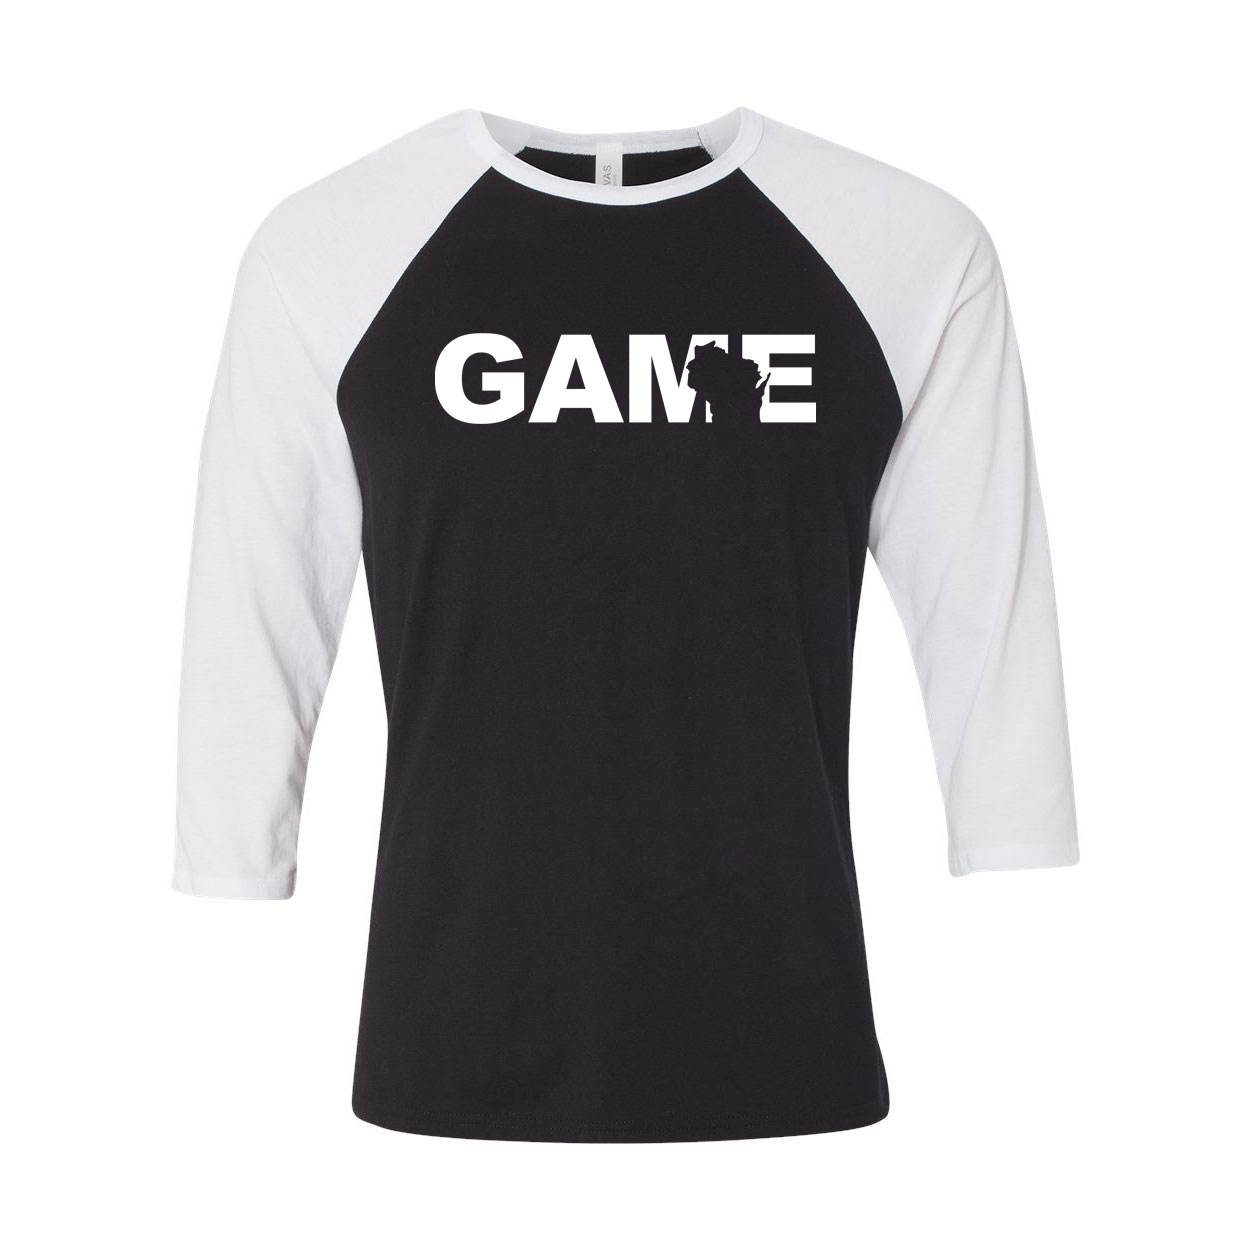 Game Wisconsin Classic Raglan Shirt Black/White (White Logo)